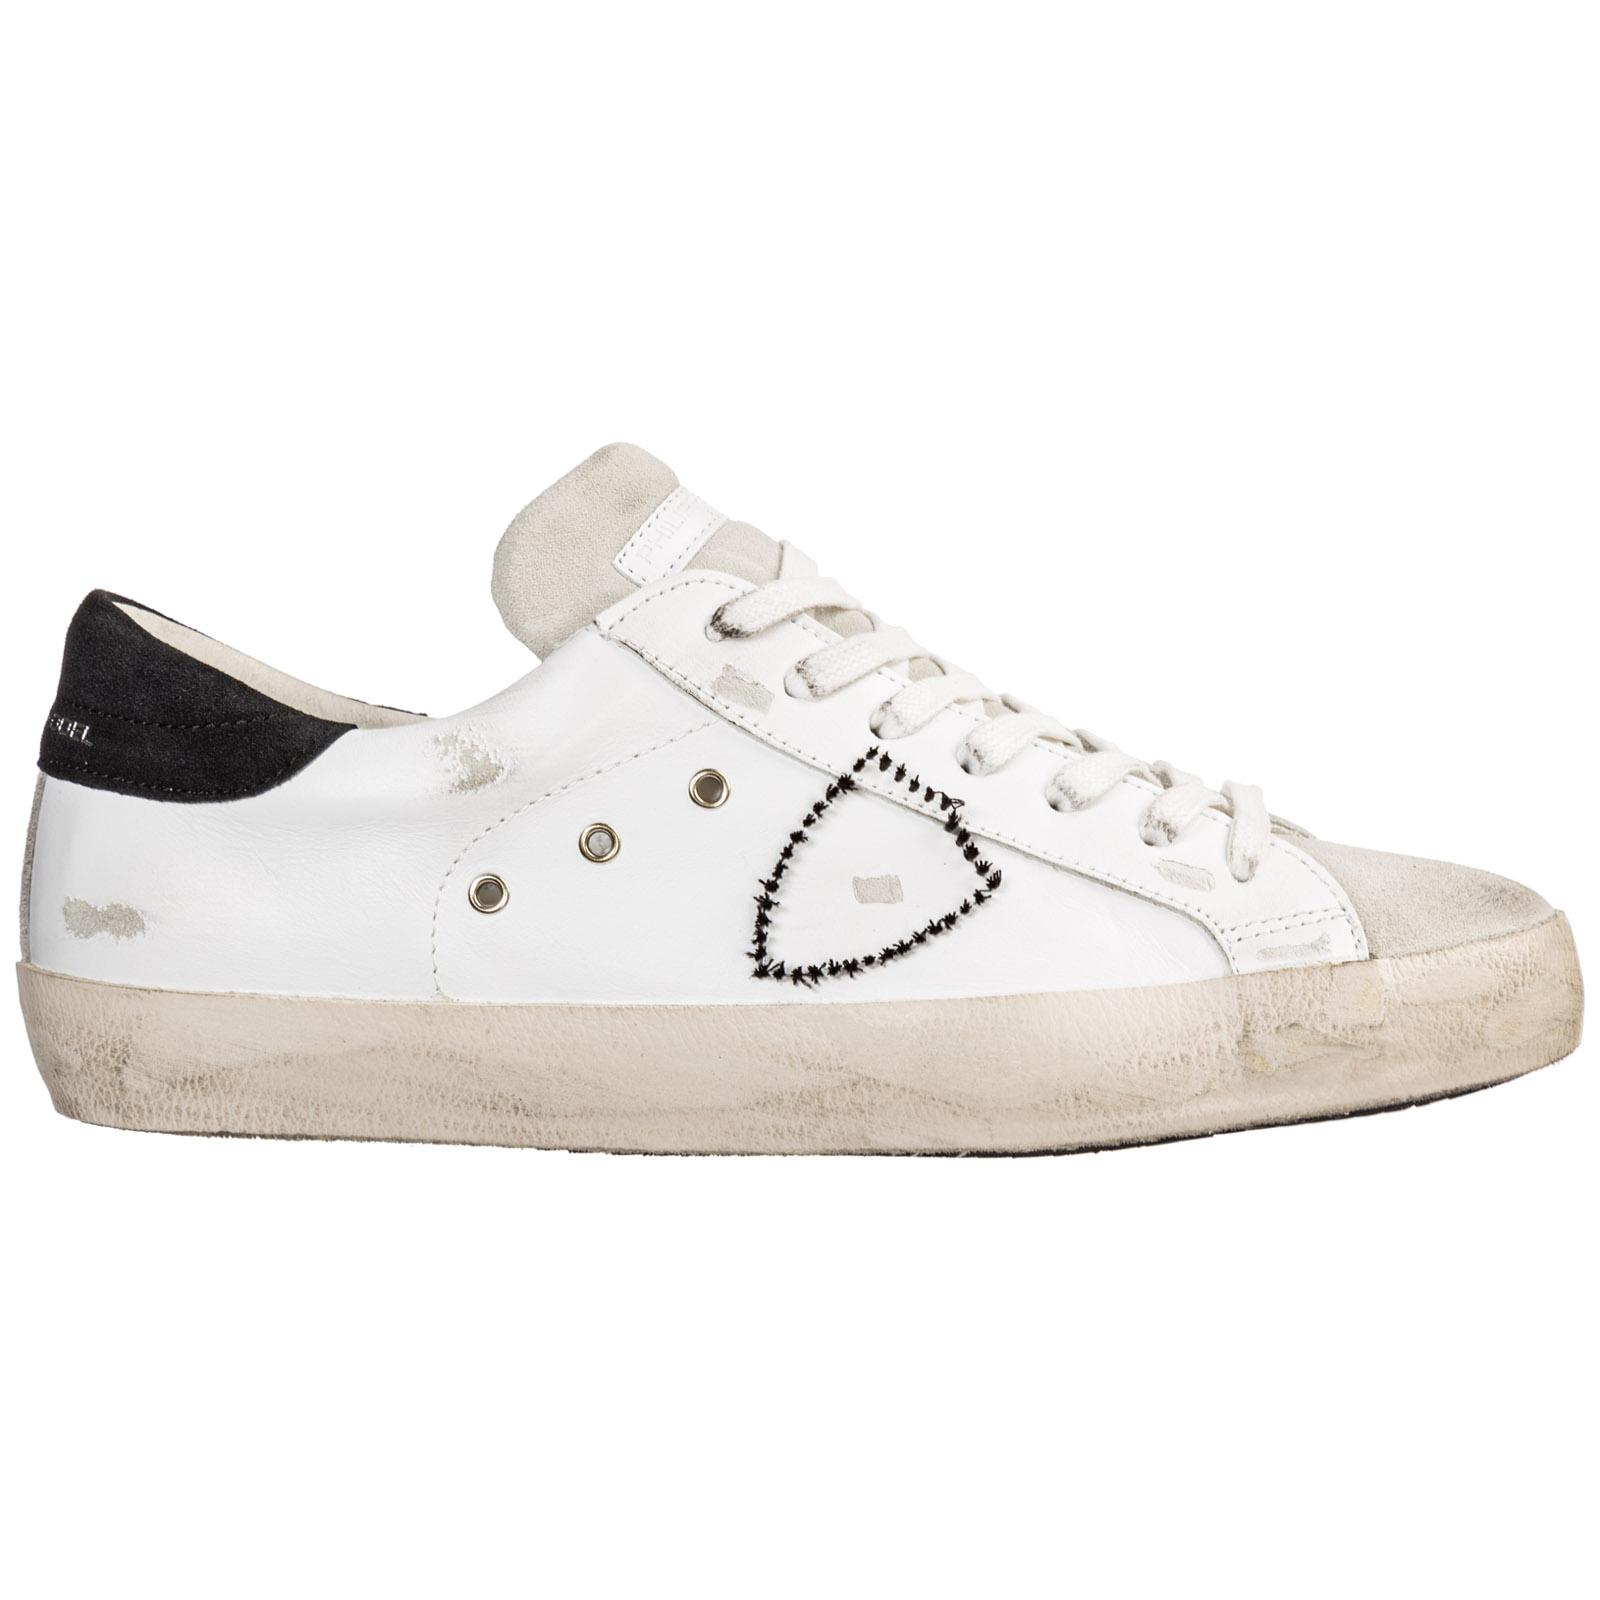 more photos 10d84 a2686 Scarpe sneakers uomo in pelle paris